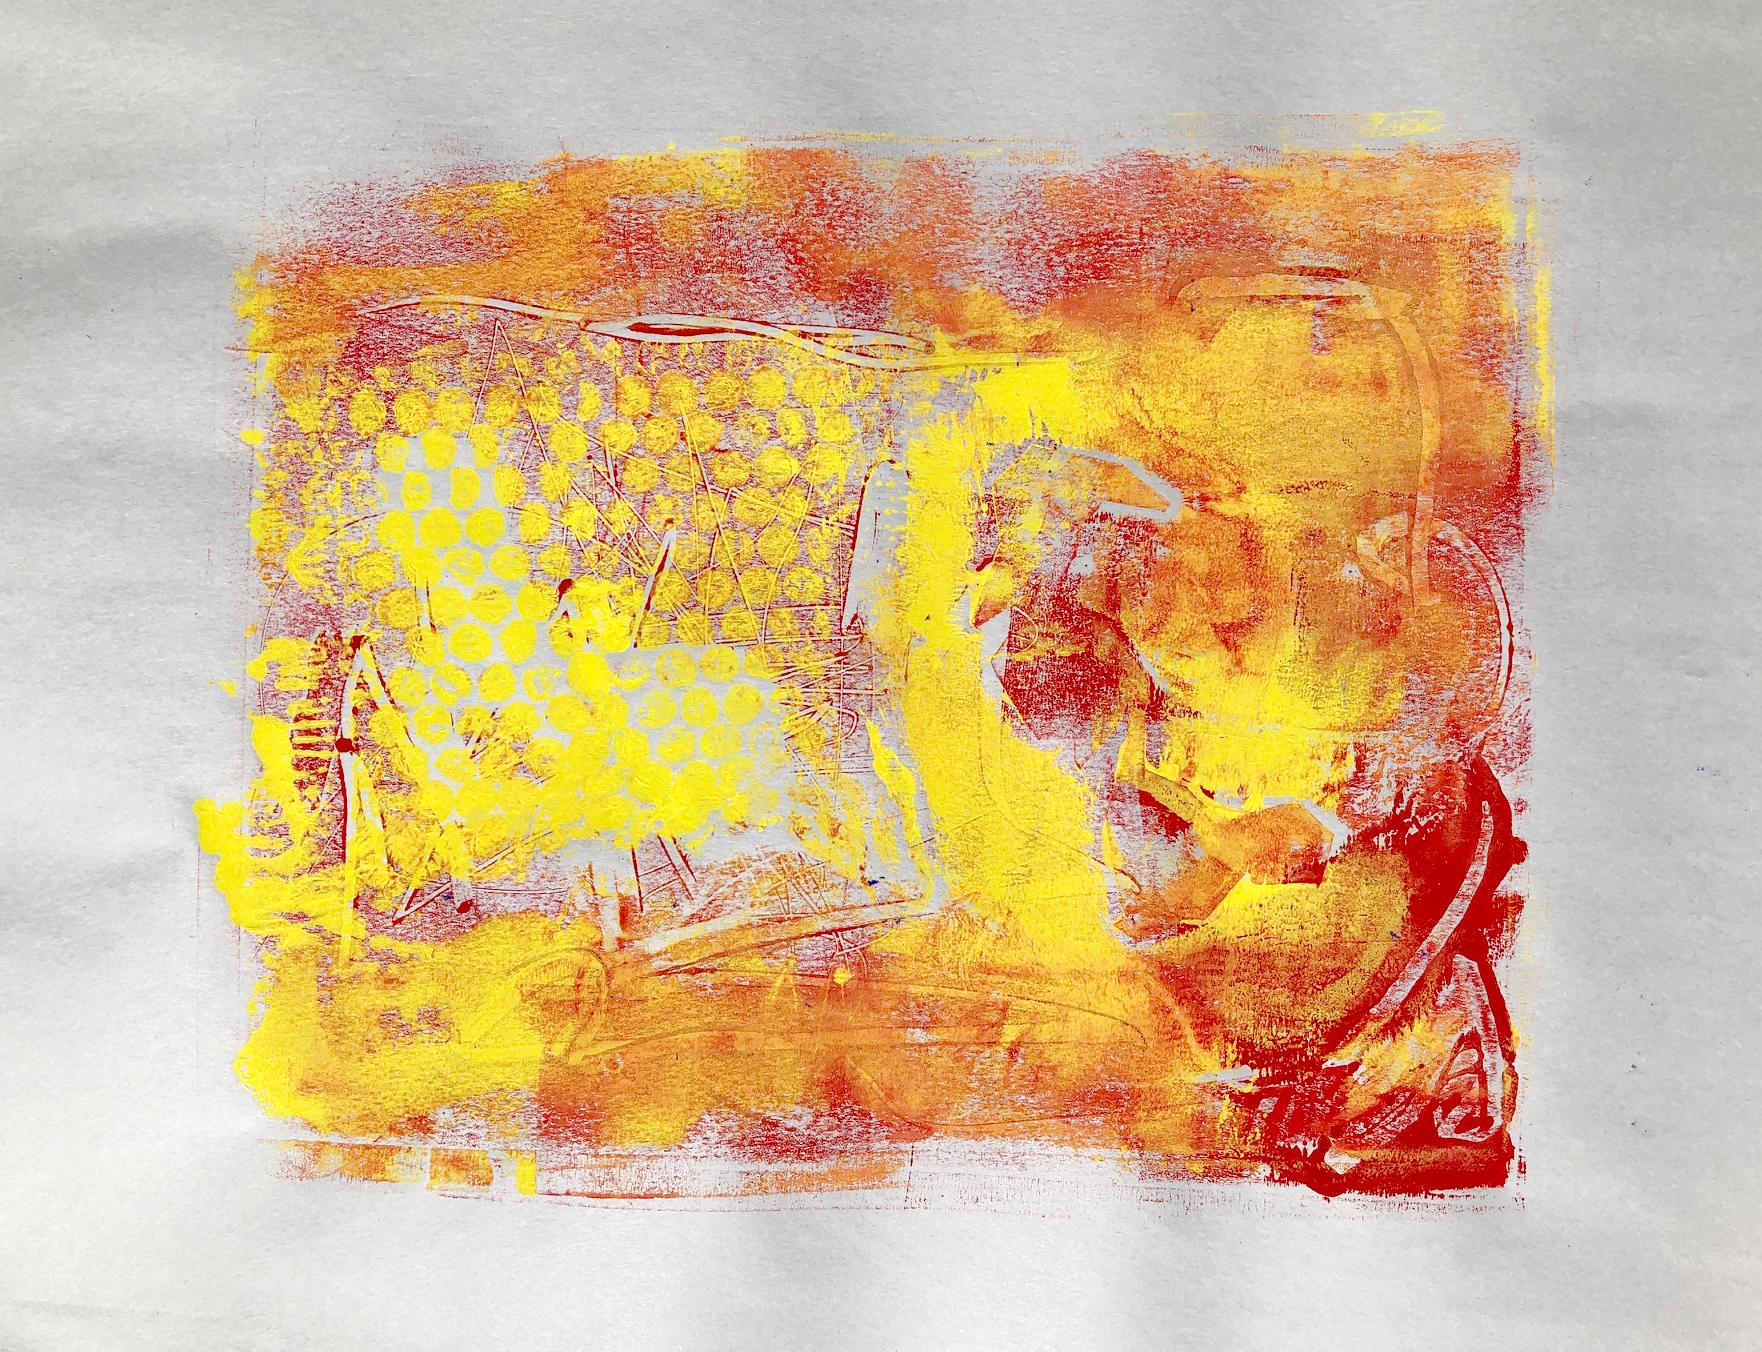 Monoprint test on Newsprint paper using different textures: bubblewrap, rope.